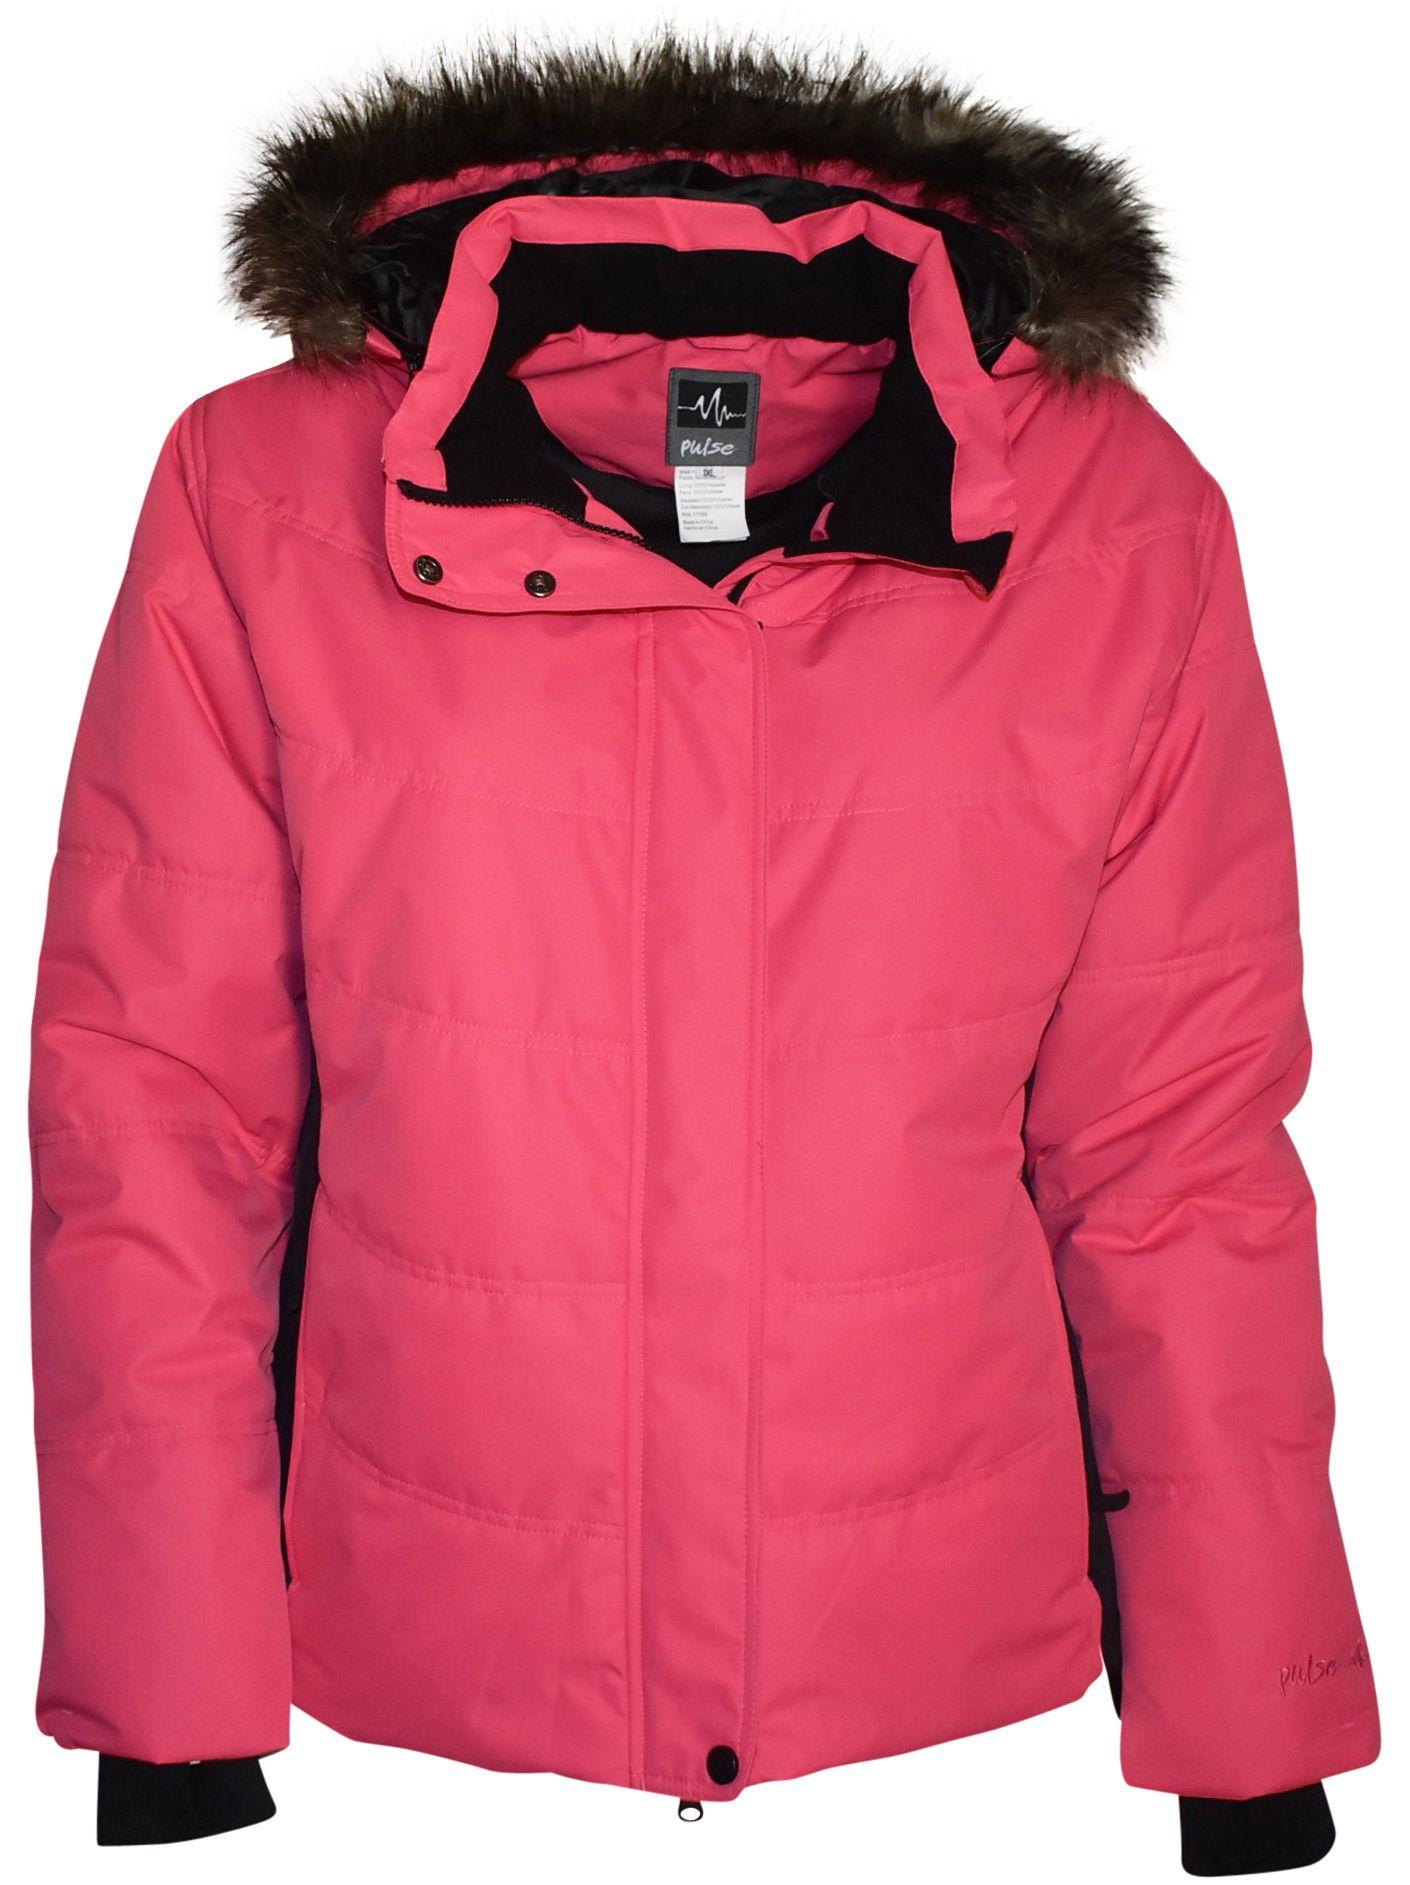 Pulse Women S Plus Size And Extended Plus Size Aspens Calling Jacket Juicy Melon With Black Sides 1x Fits 16 Women Ski Jacket Snow Skirt Winter Coat Warmest [ 1885 x 1410 Pixel ]